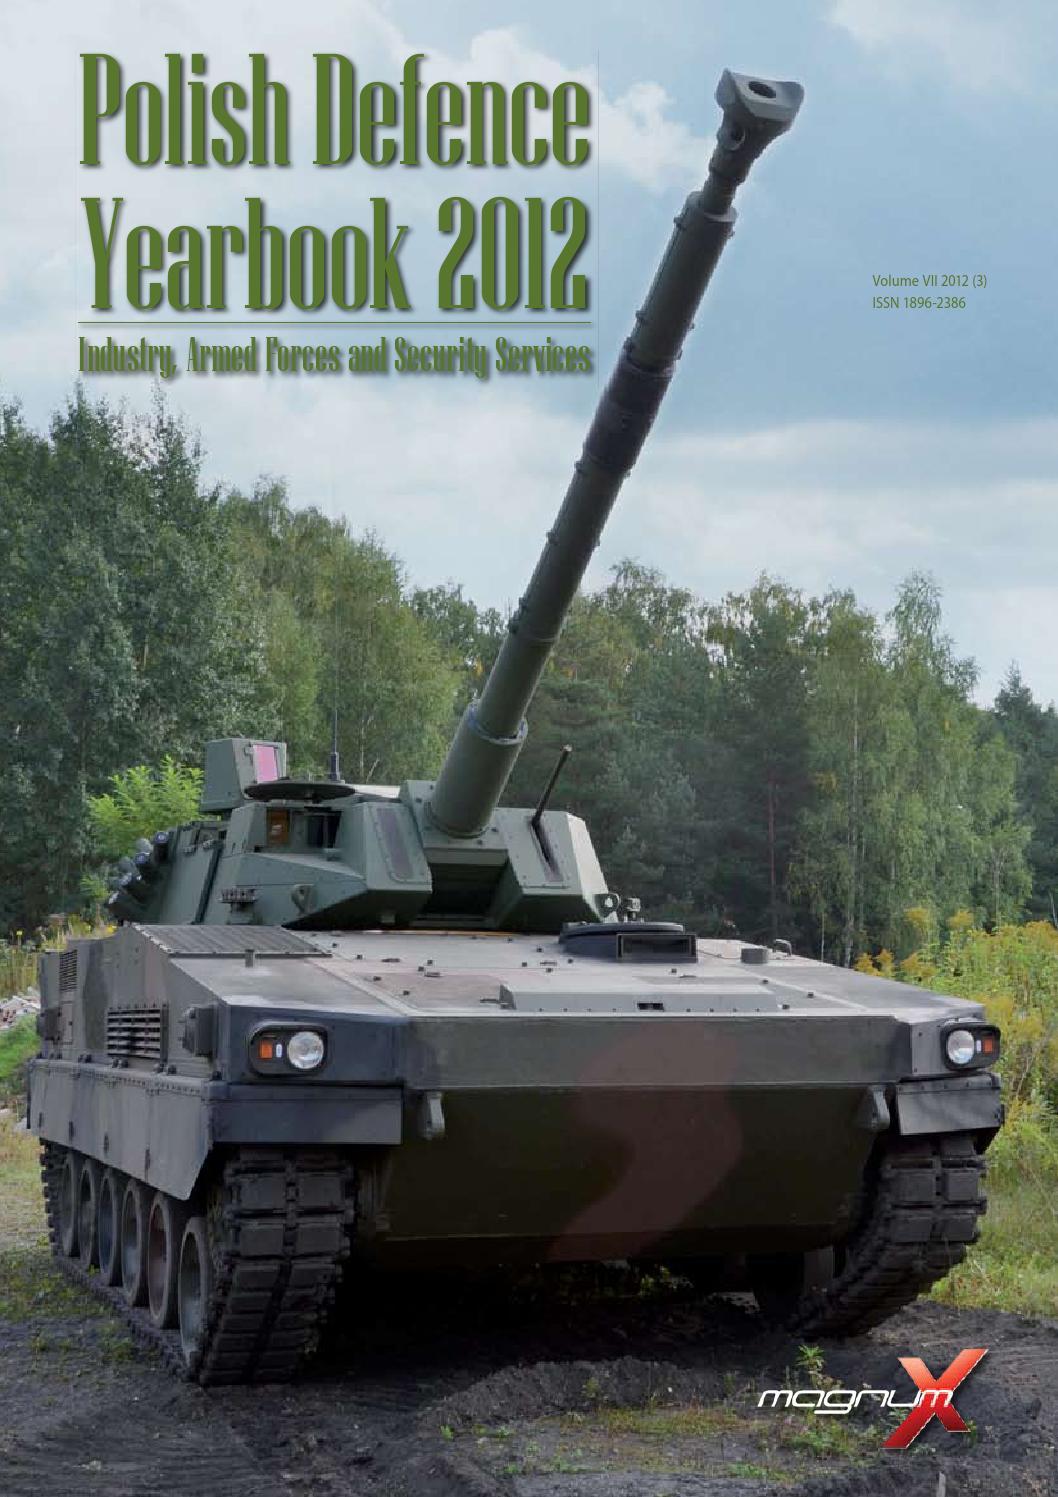 Polish Defence Yearbook 2012 by Marek Szyl - issuu